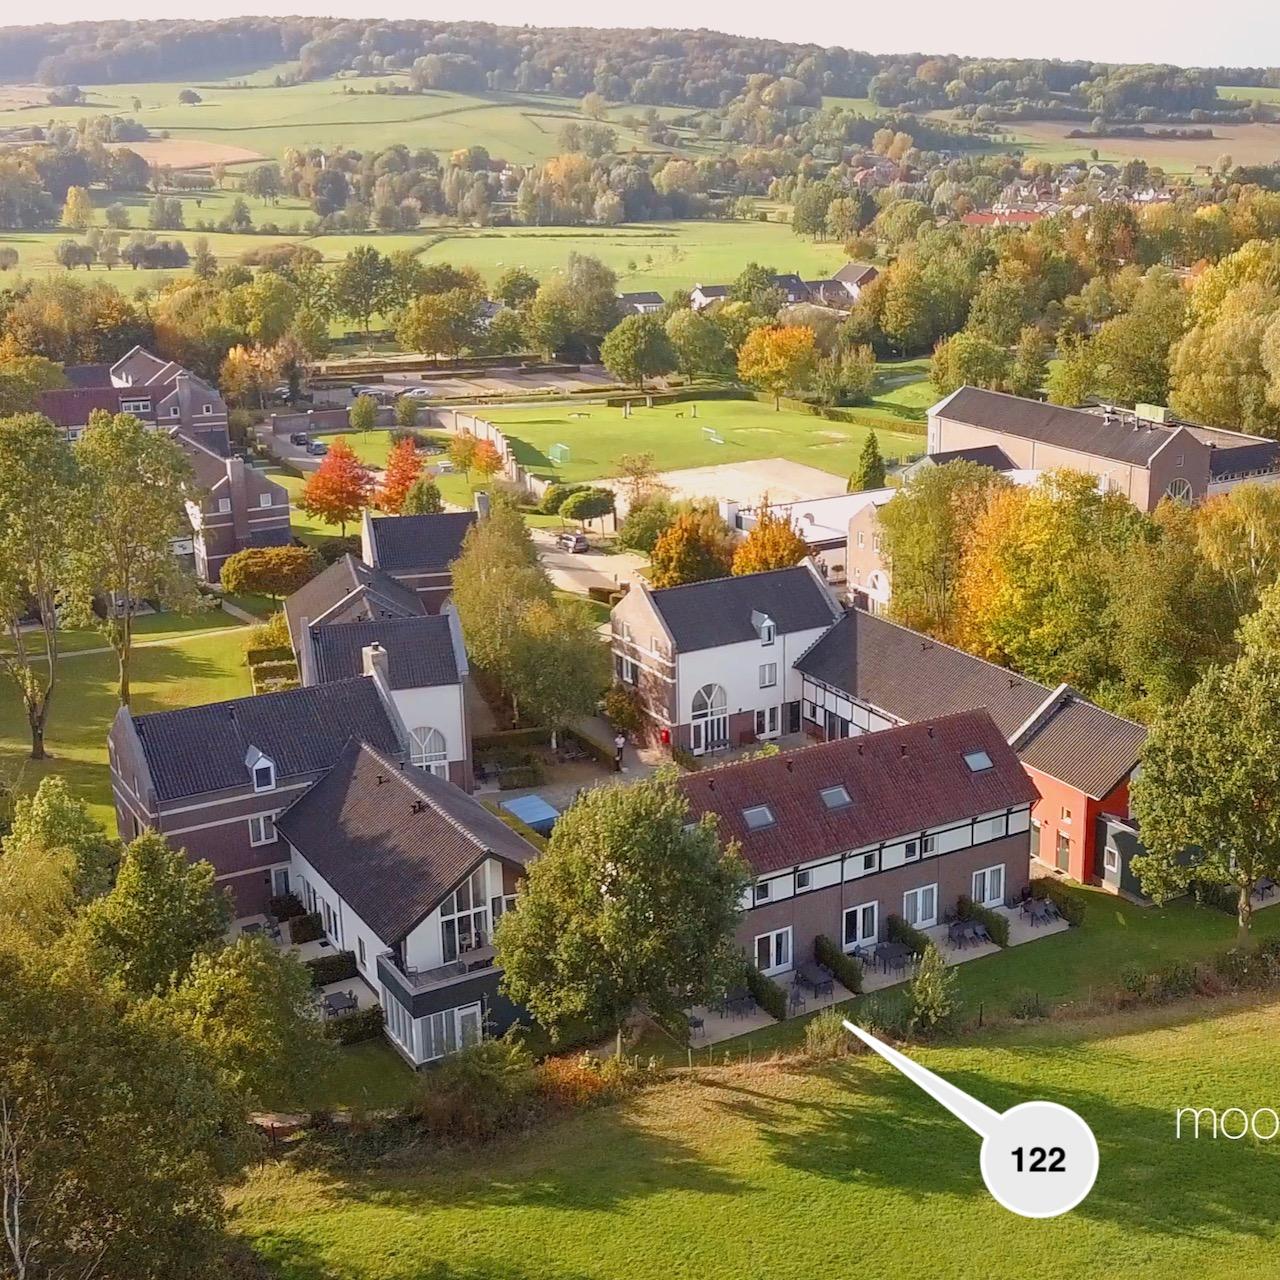 Mechelerhof ligging van Bosrank 122